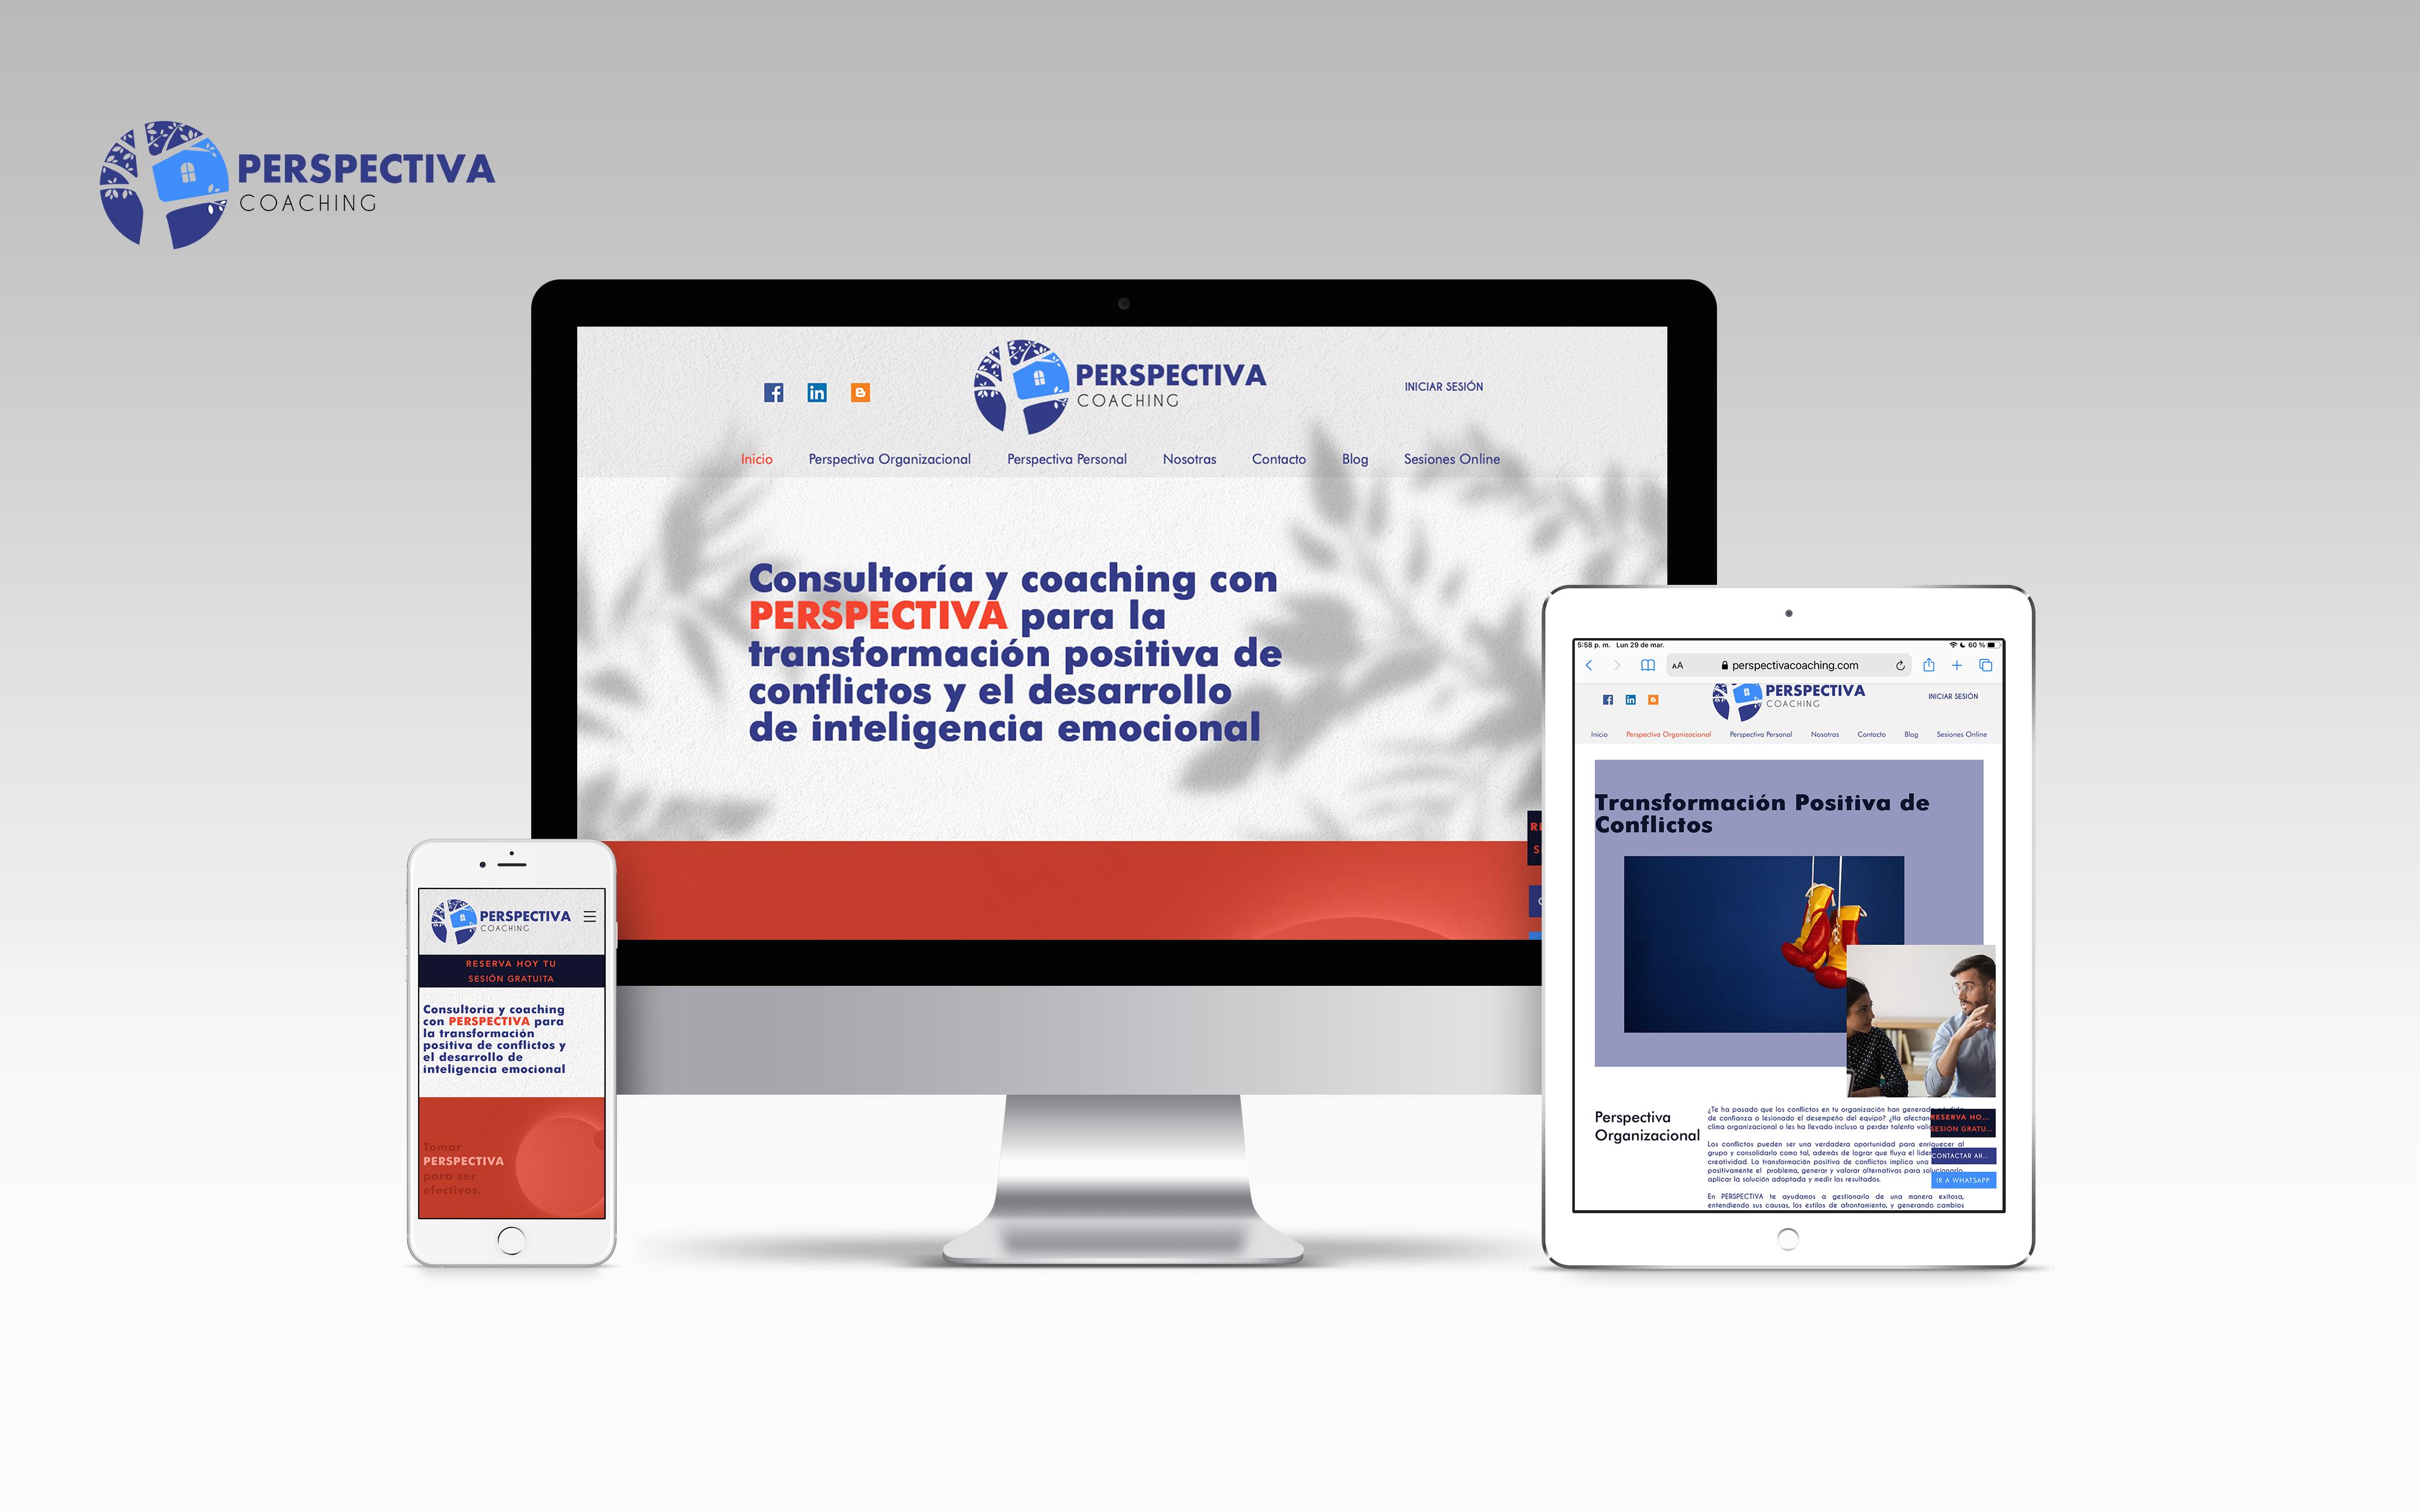 Perspectiva Coaching Reservas, blog, sitio web corporativo de Perspecti...